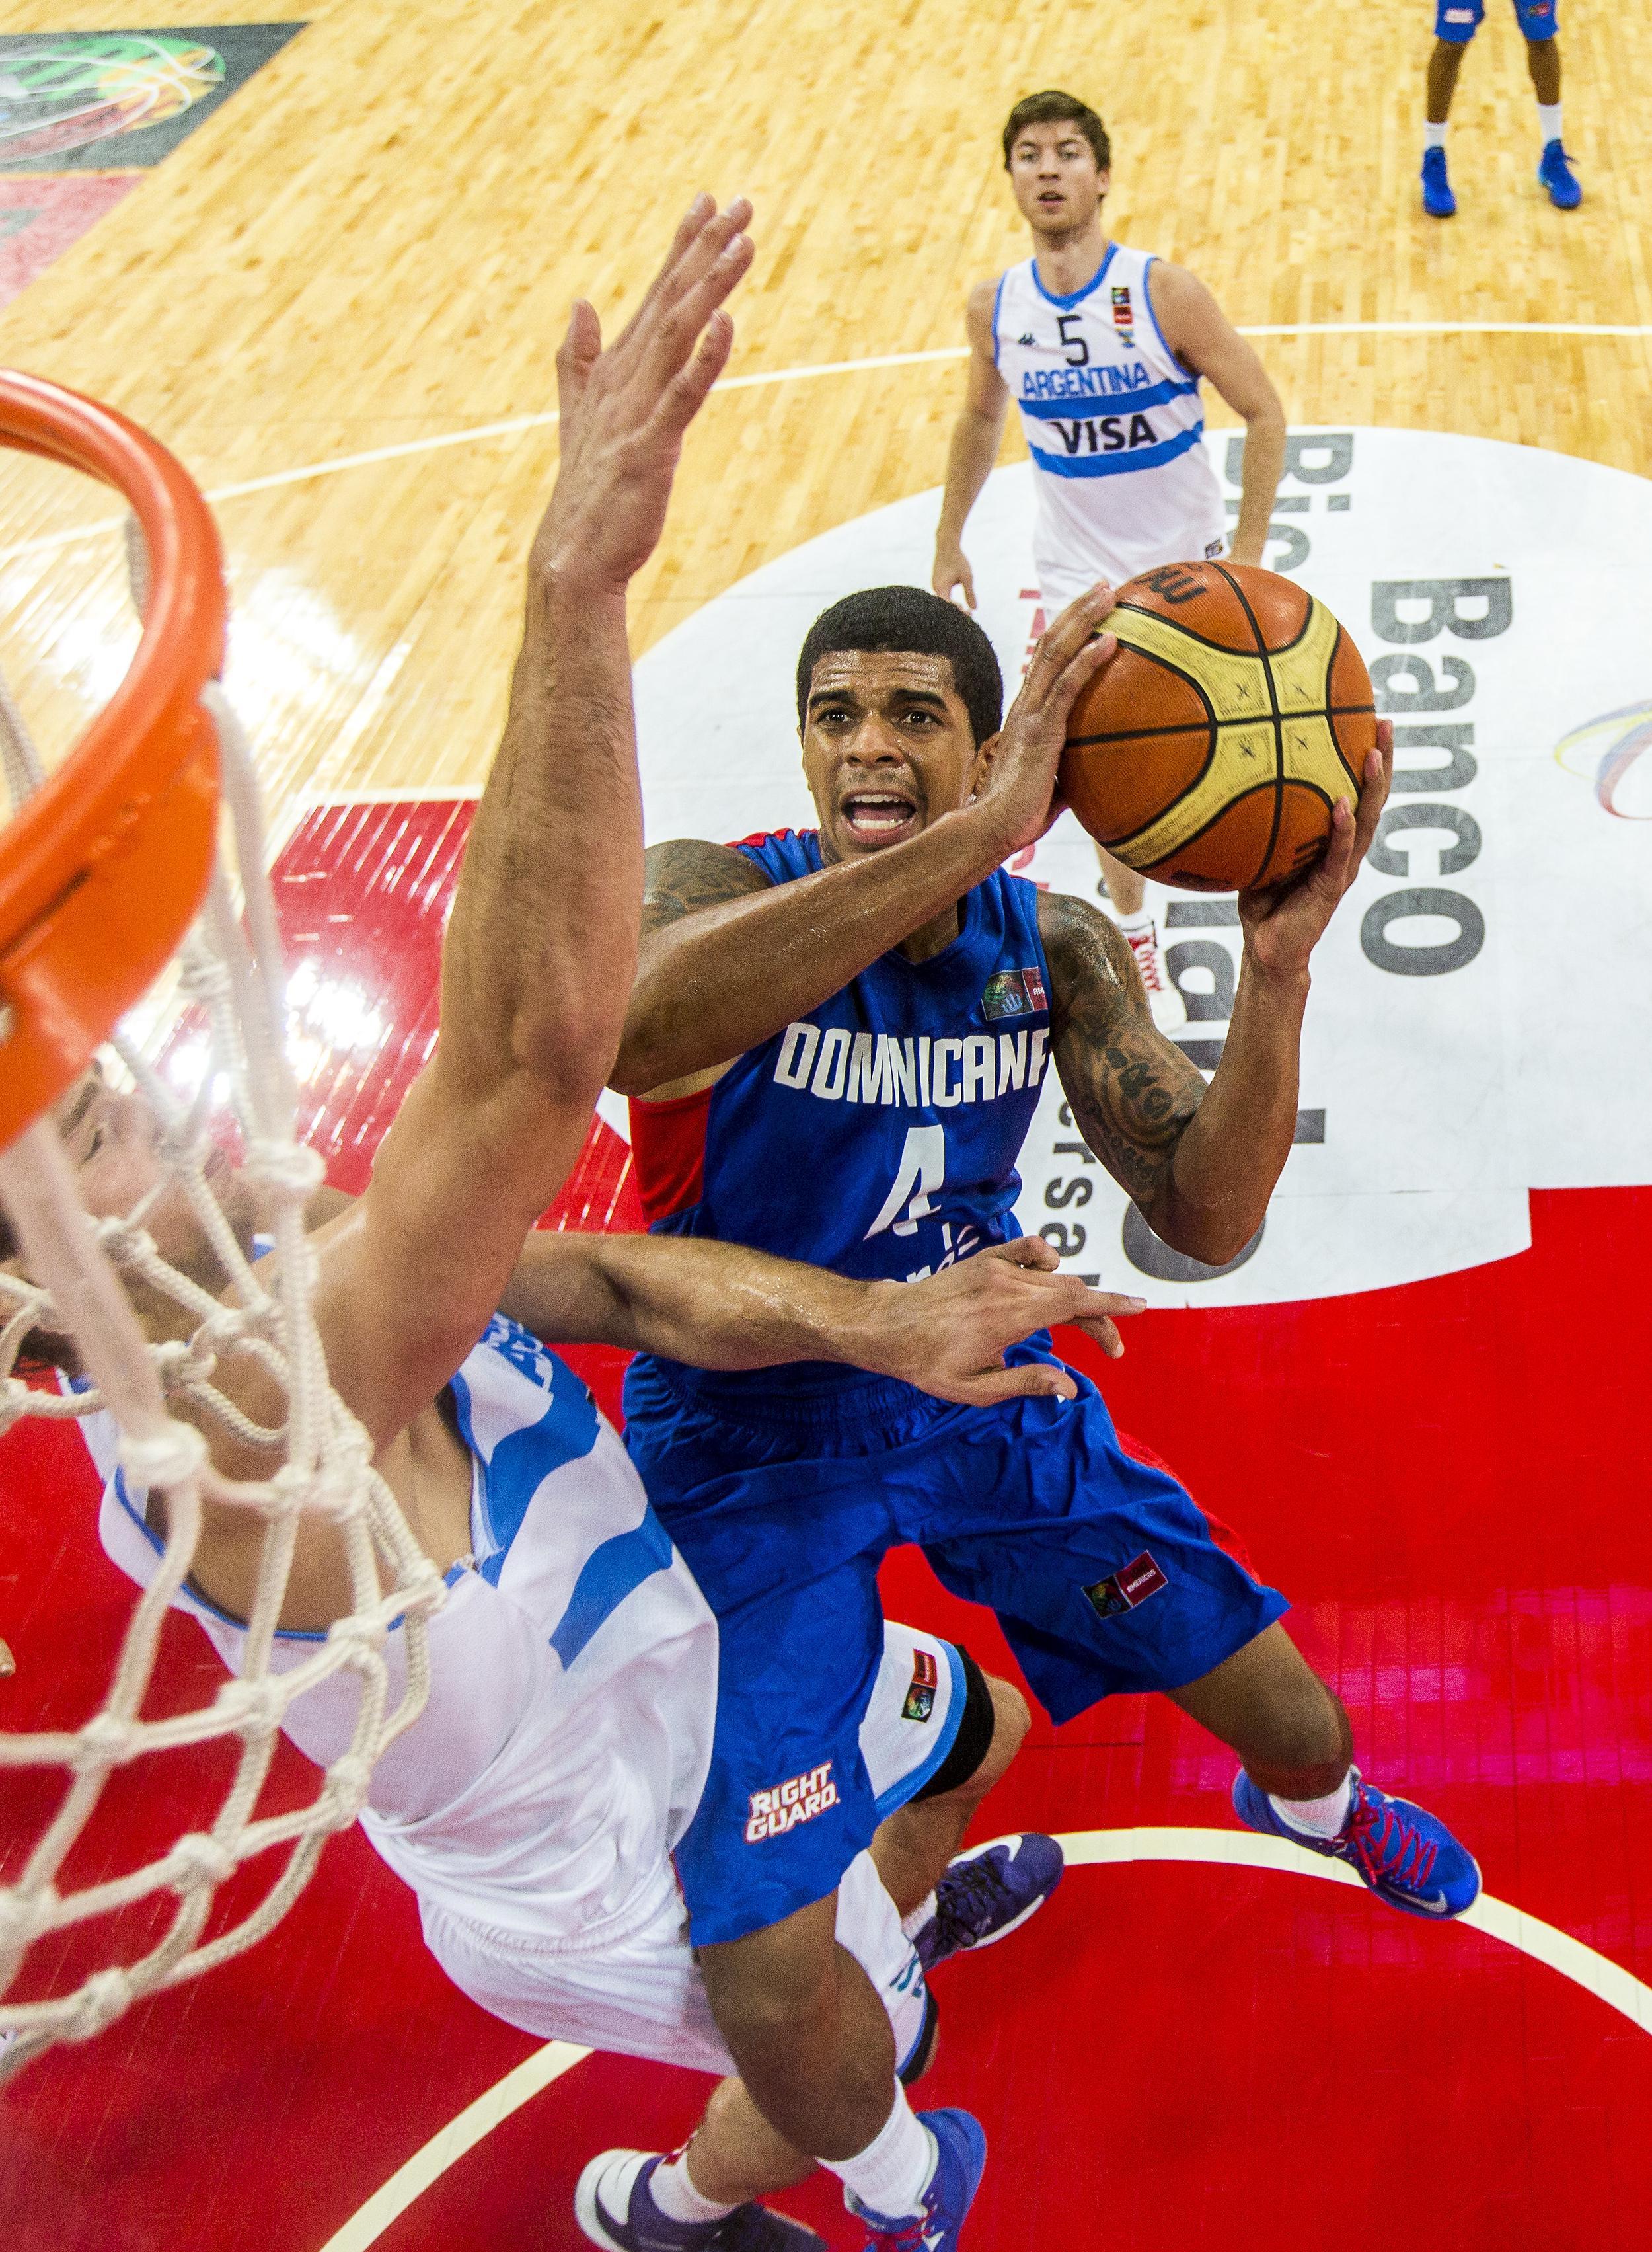 Edgar Sosa (Dominican Republic) Attacks the Basket